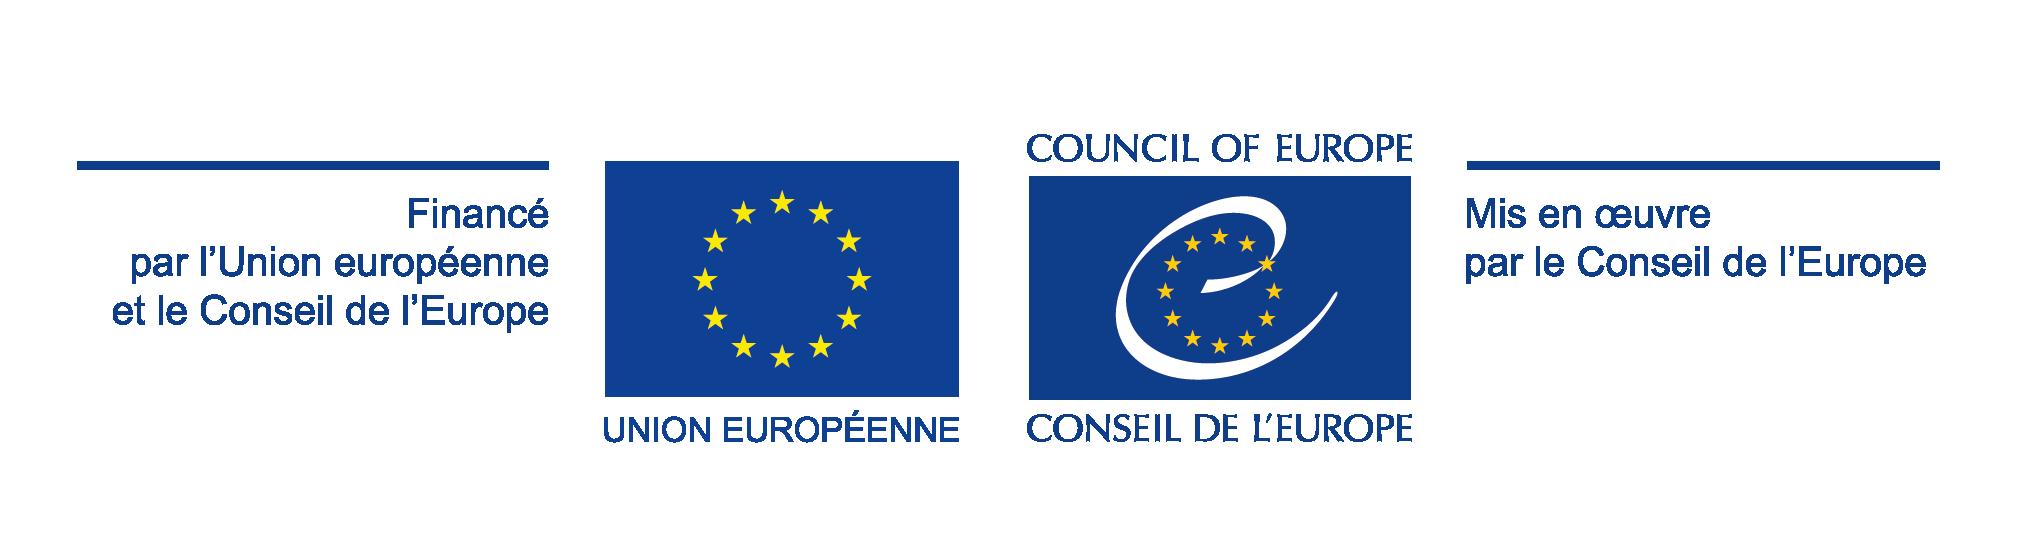 https://www.coe.int/documents/29148167/34952581/Avant+2021+Funded-EU-and-COE-Implemented-COE-quadri-FR.png/3a3999db-8206-2226-afa9-7c595fdf3ea6?t=1615303051000